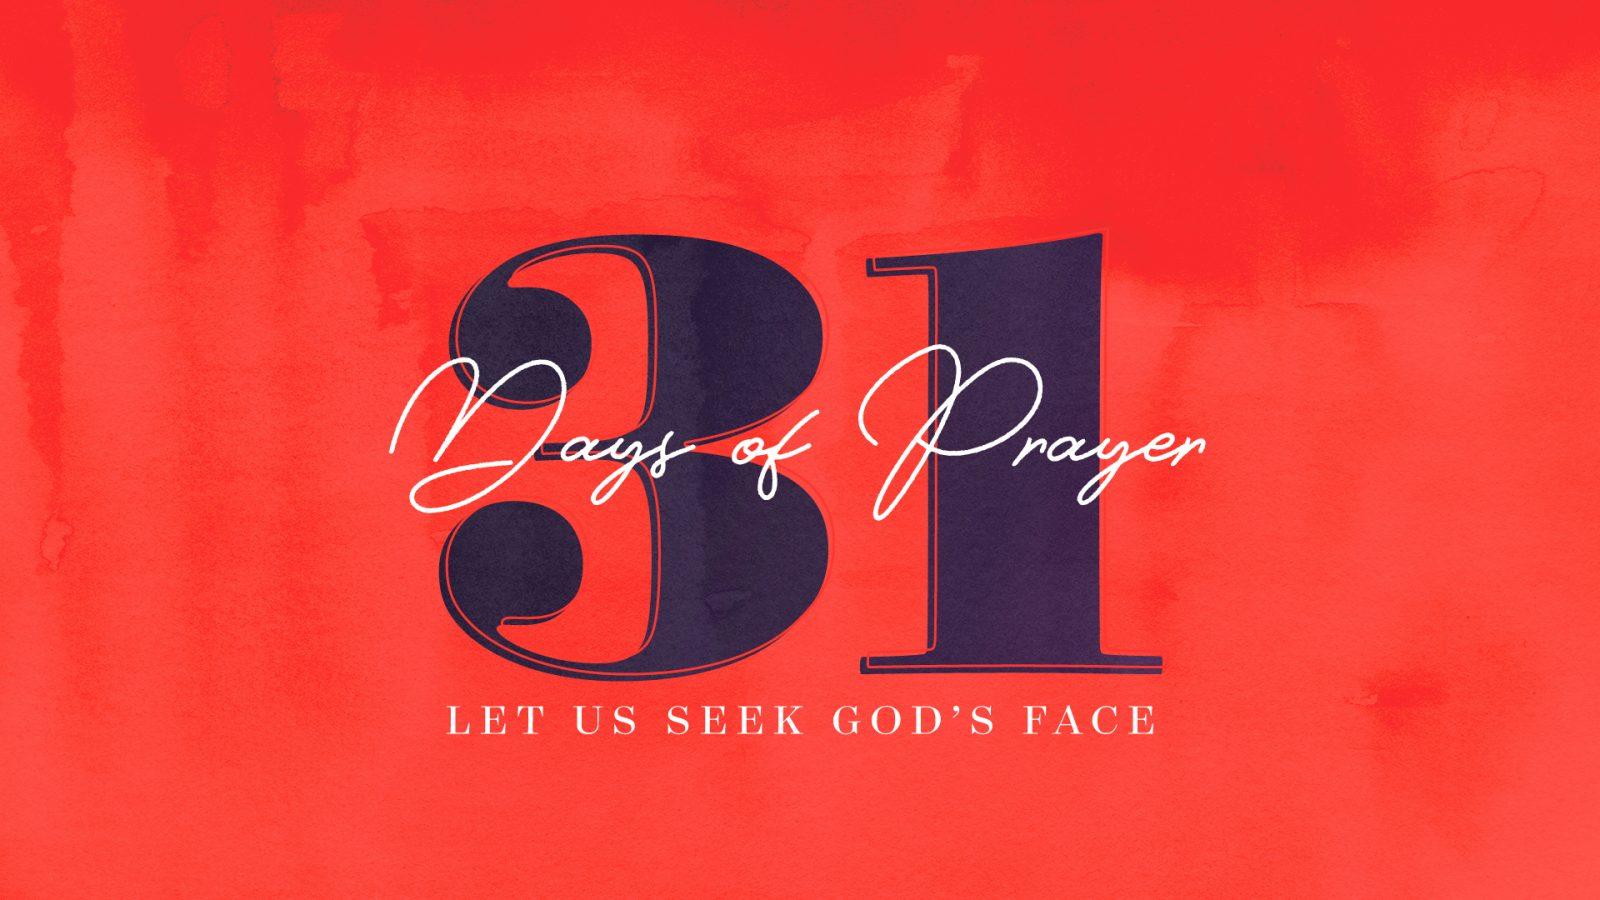 31_days_of_prayer-title-1-Wide 16×9